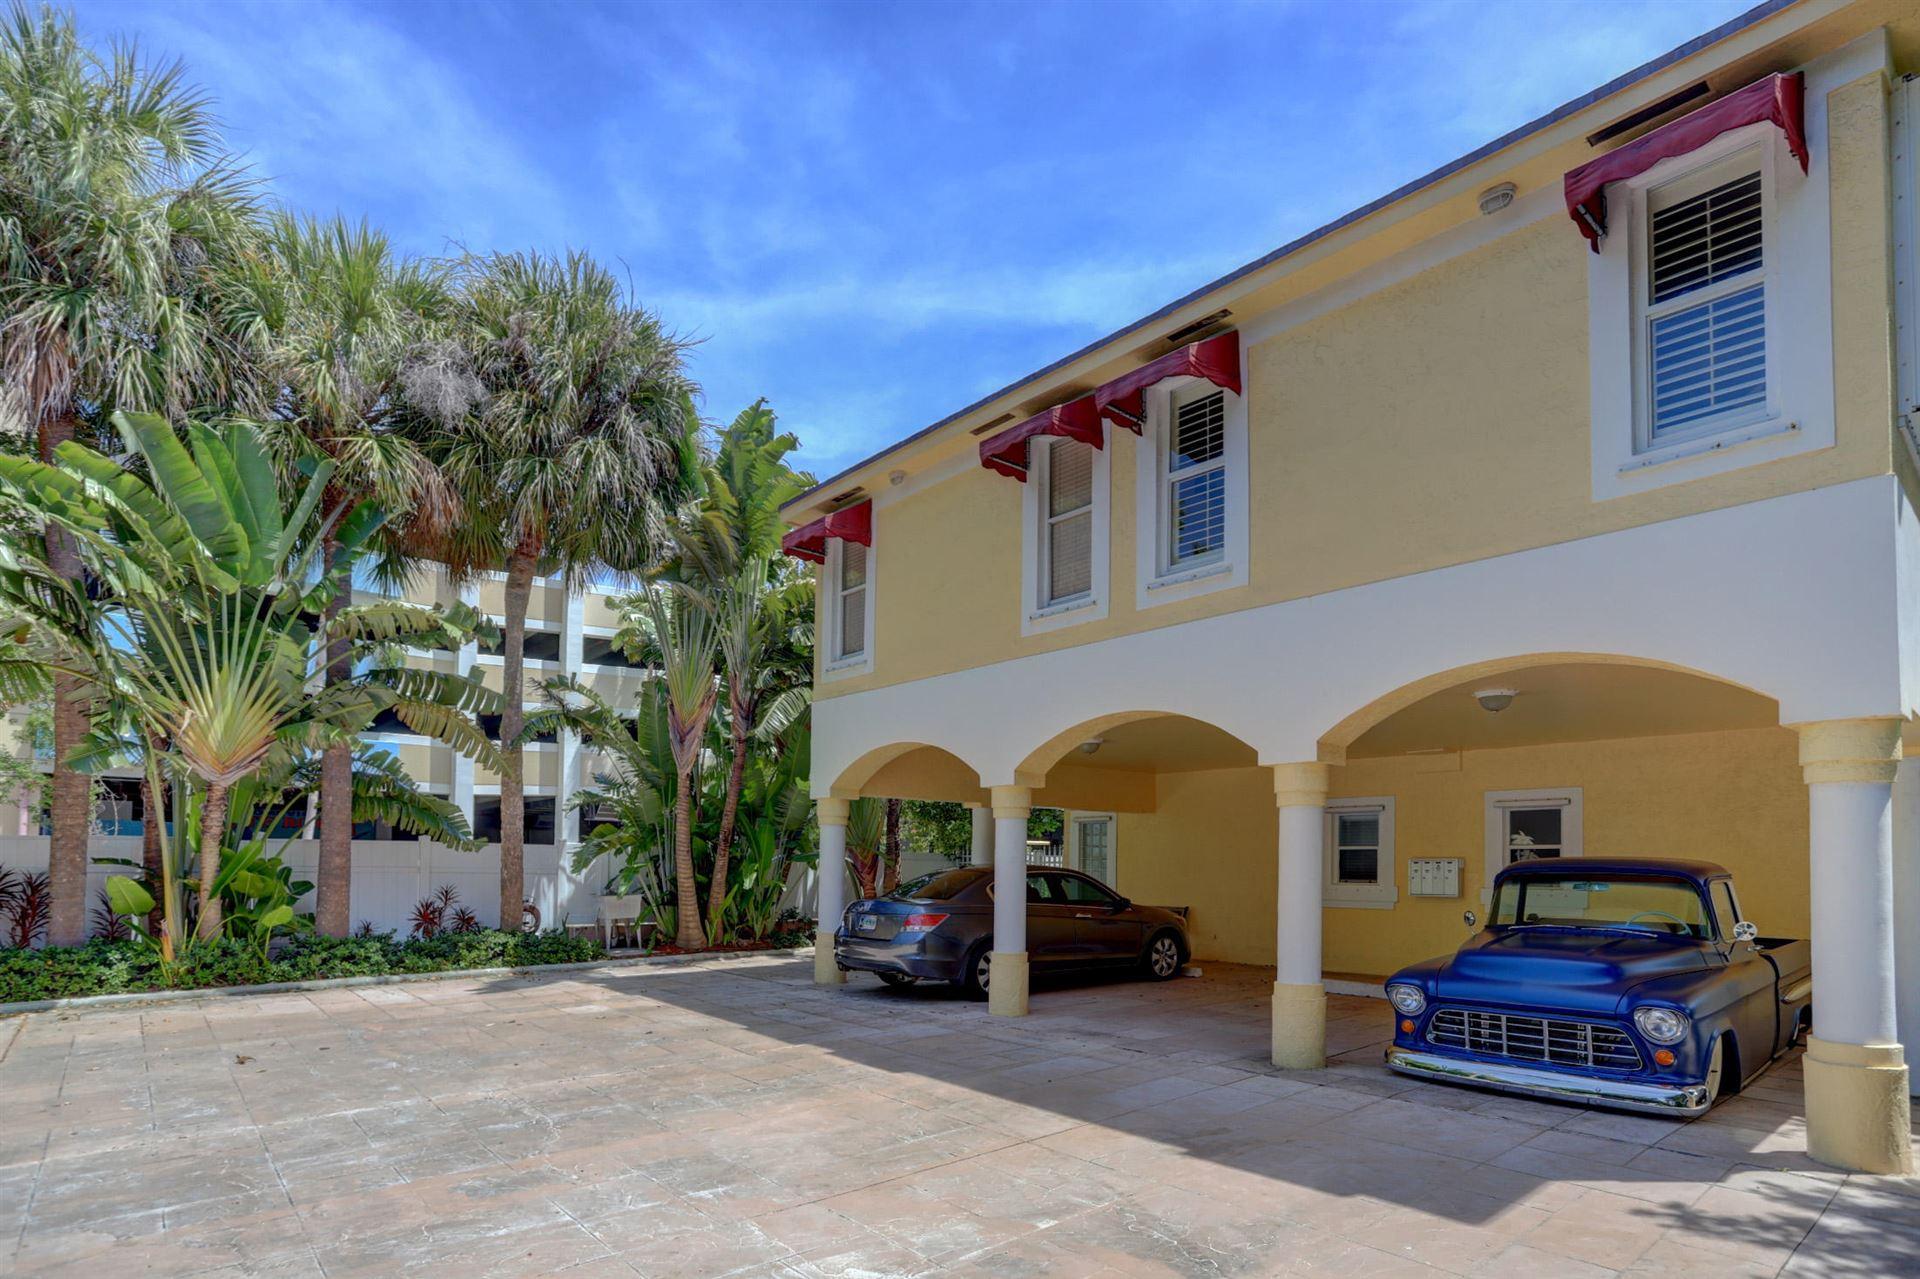 1946 NE 2nd Street, Deerfield Beach, FL 33441 - #: RX-10650372